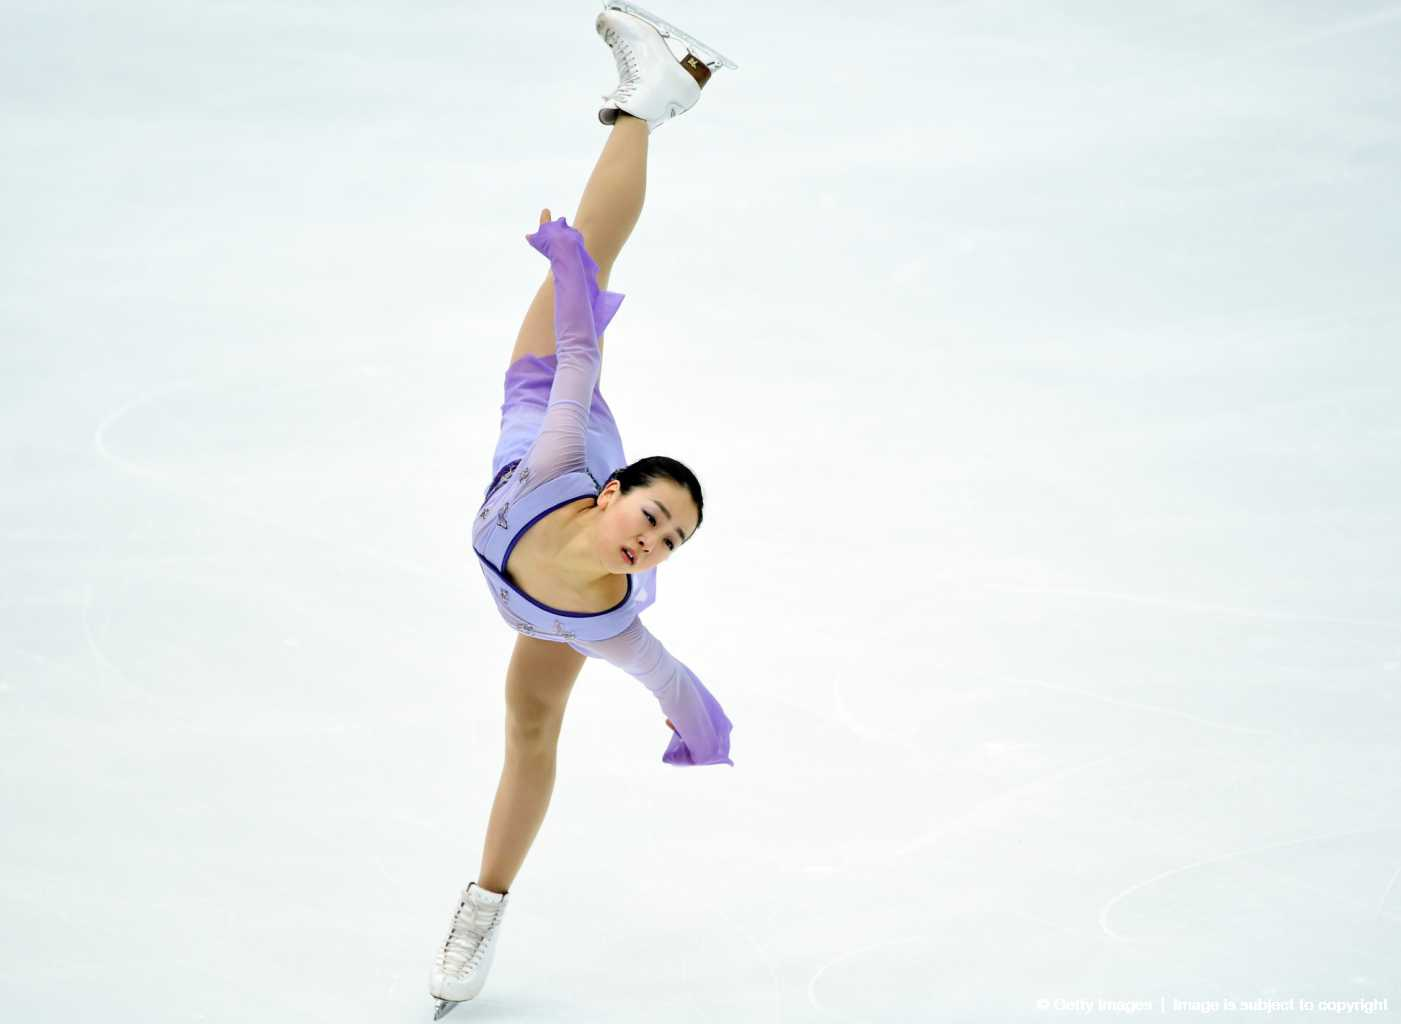 FigureSkatingMaoAsada20152016tripleaxel08.jpg